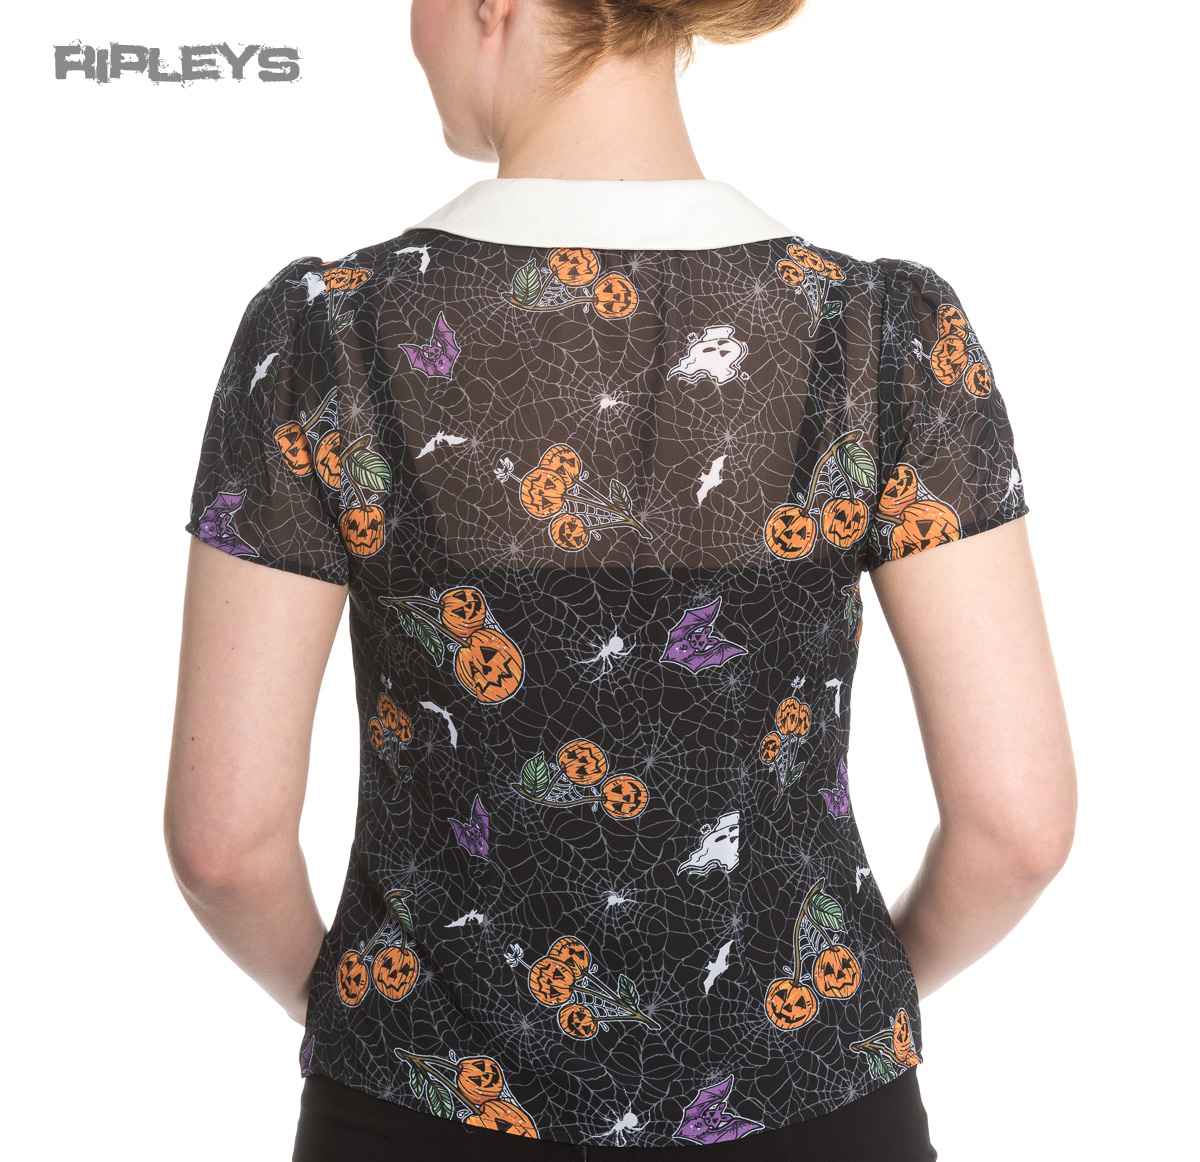 Hell-Bunny-Shirt-Top-Halloween-Webs-Pumpkins-HARLOW-Blouse-All-Sizes thumbnail 32